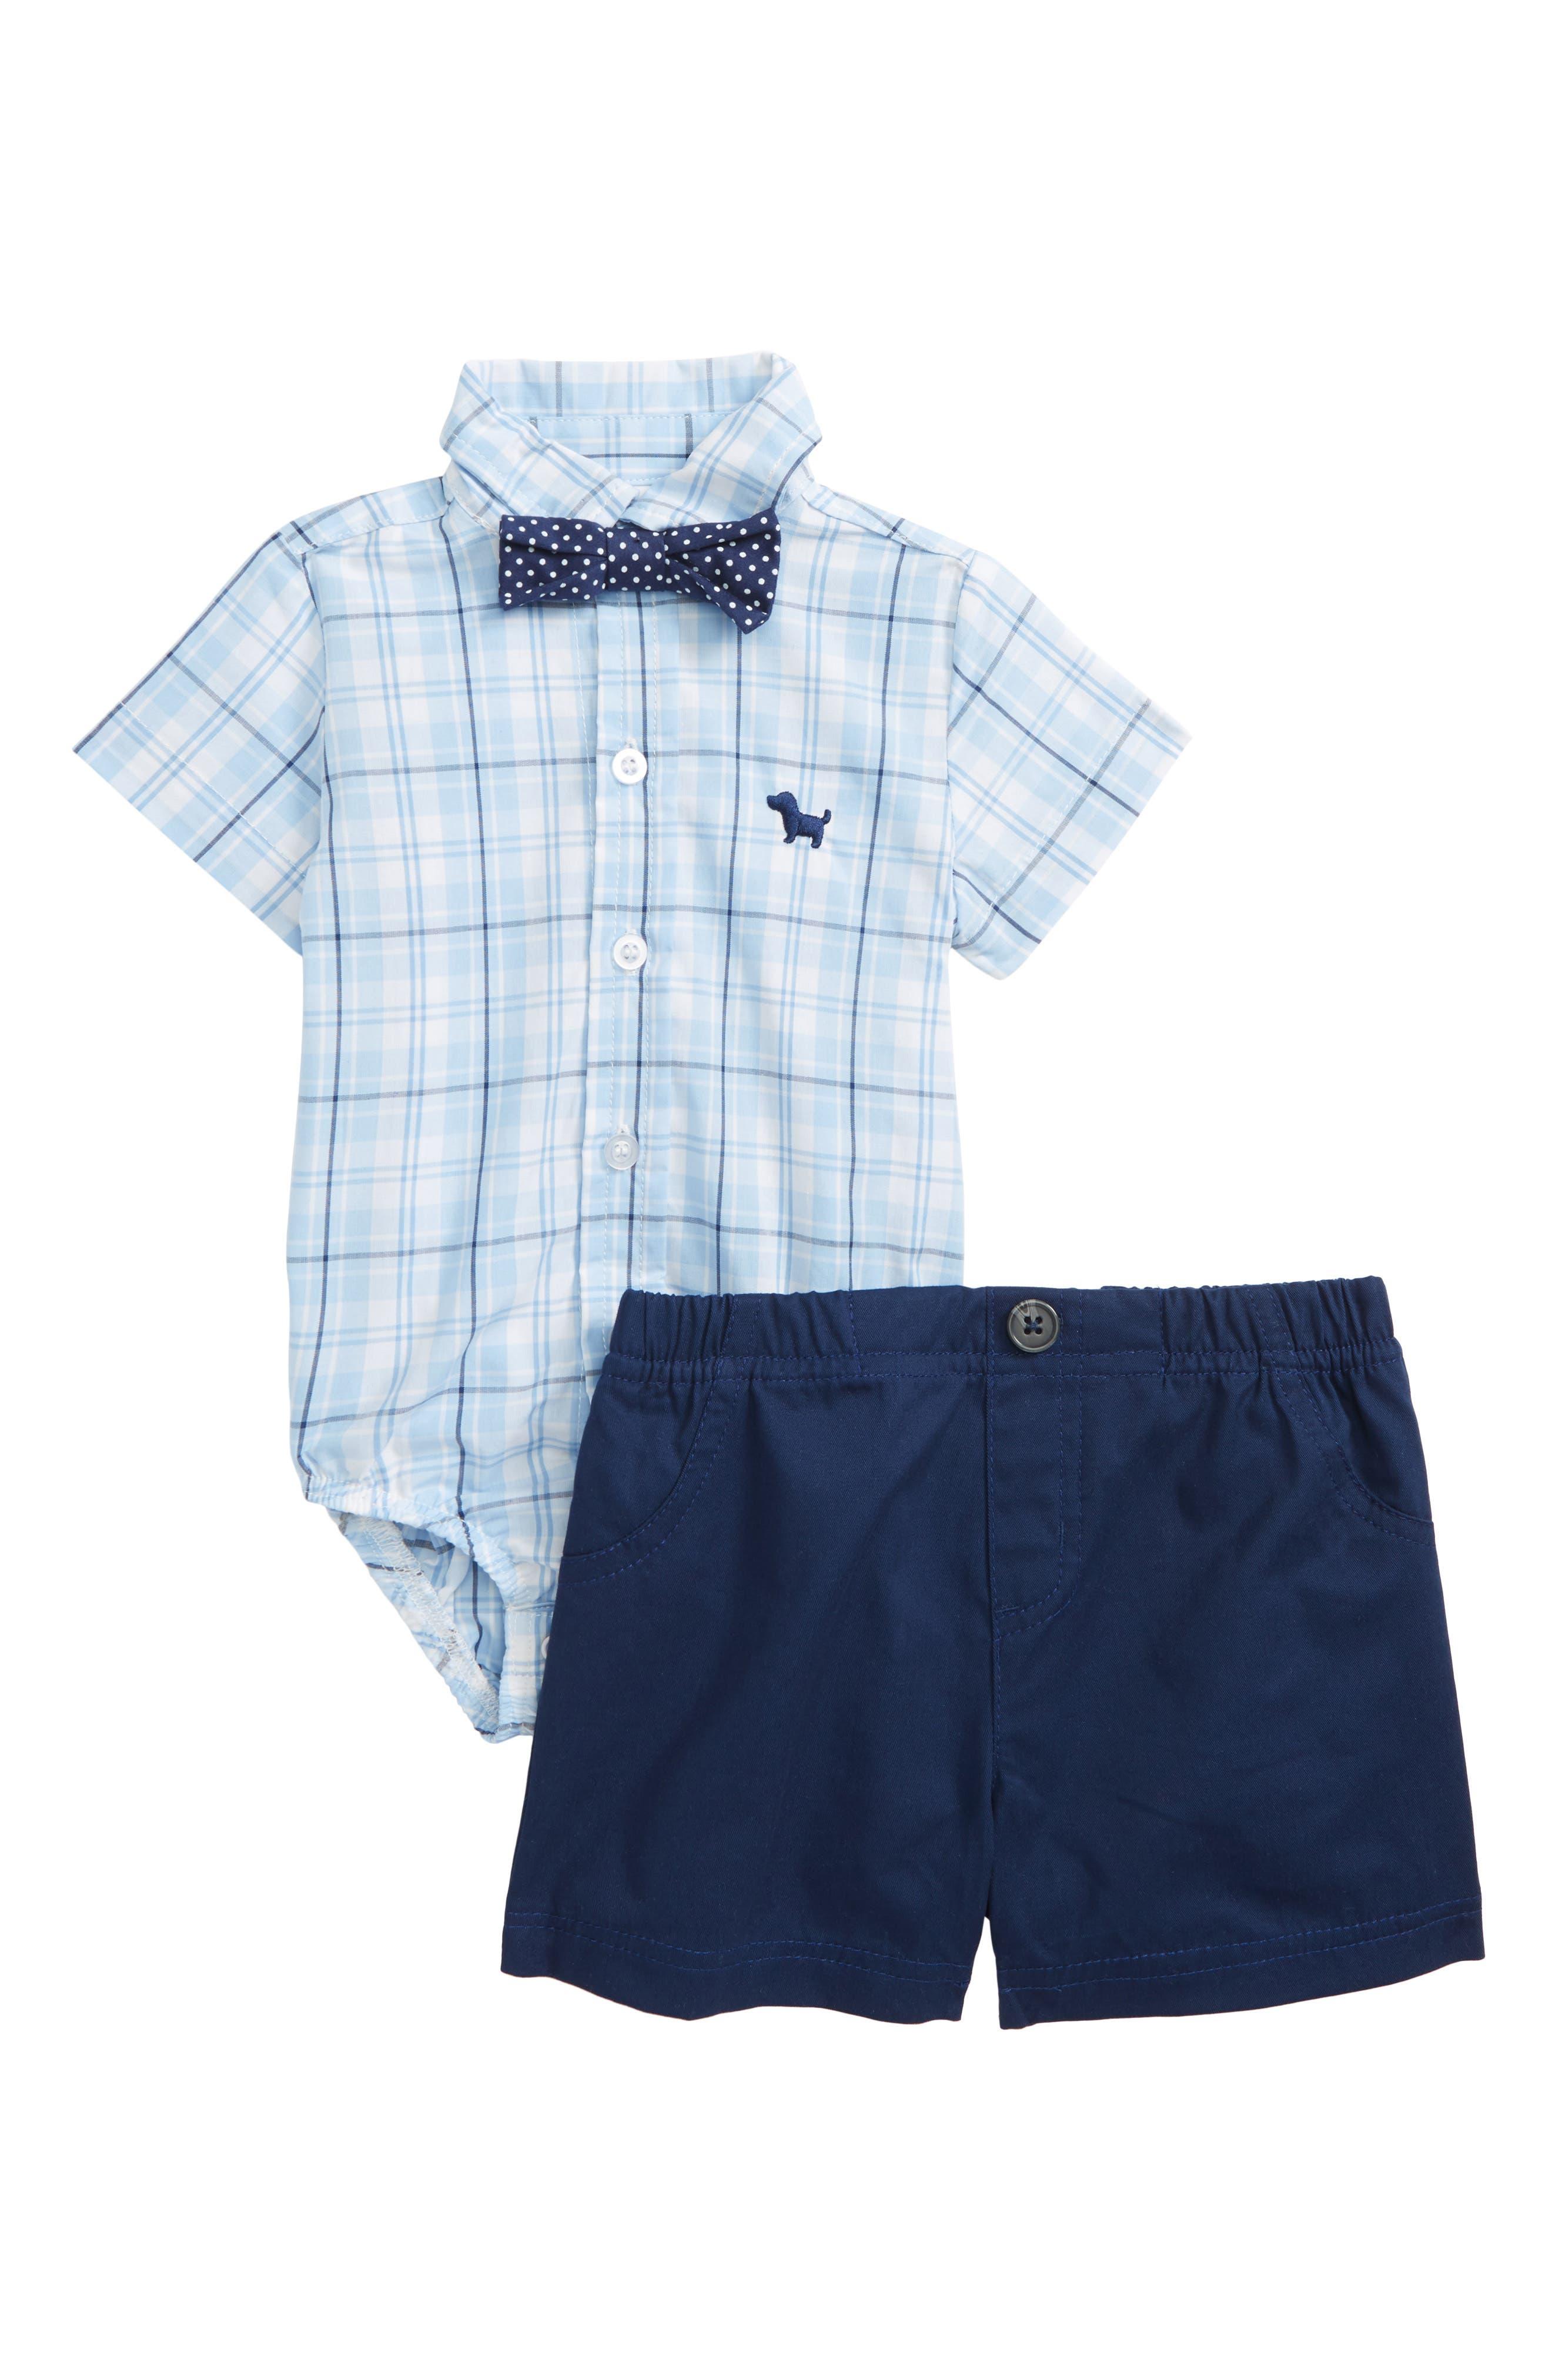 Little Me Check Bodysuit, Bow Tie & Shorts Set (Baby Boys)